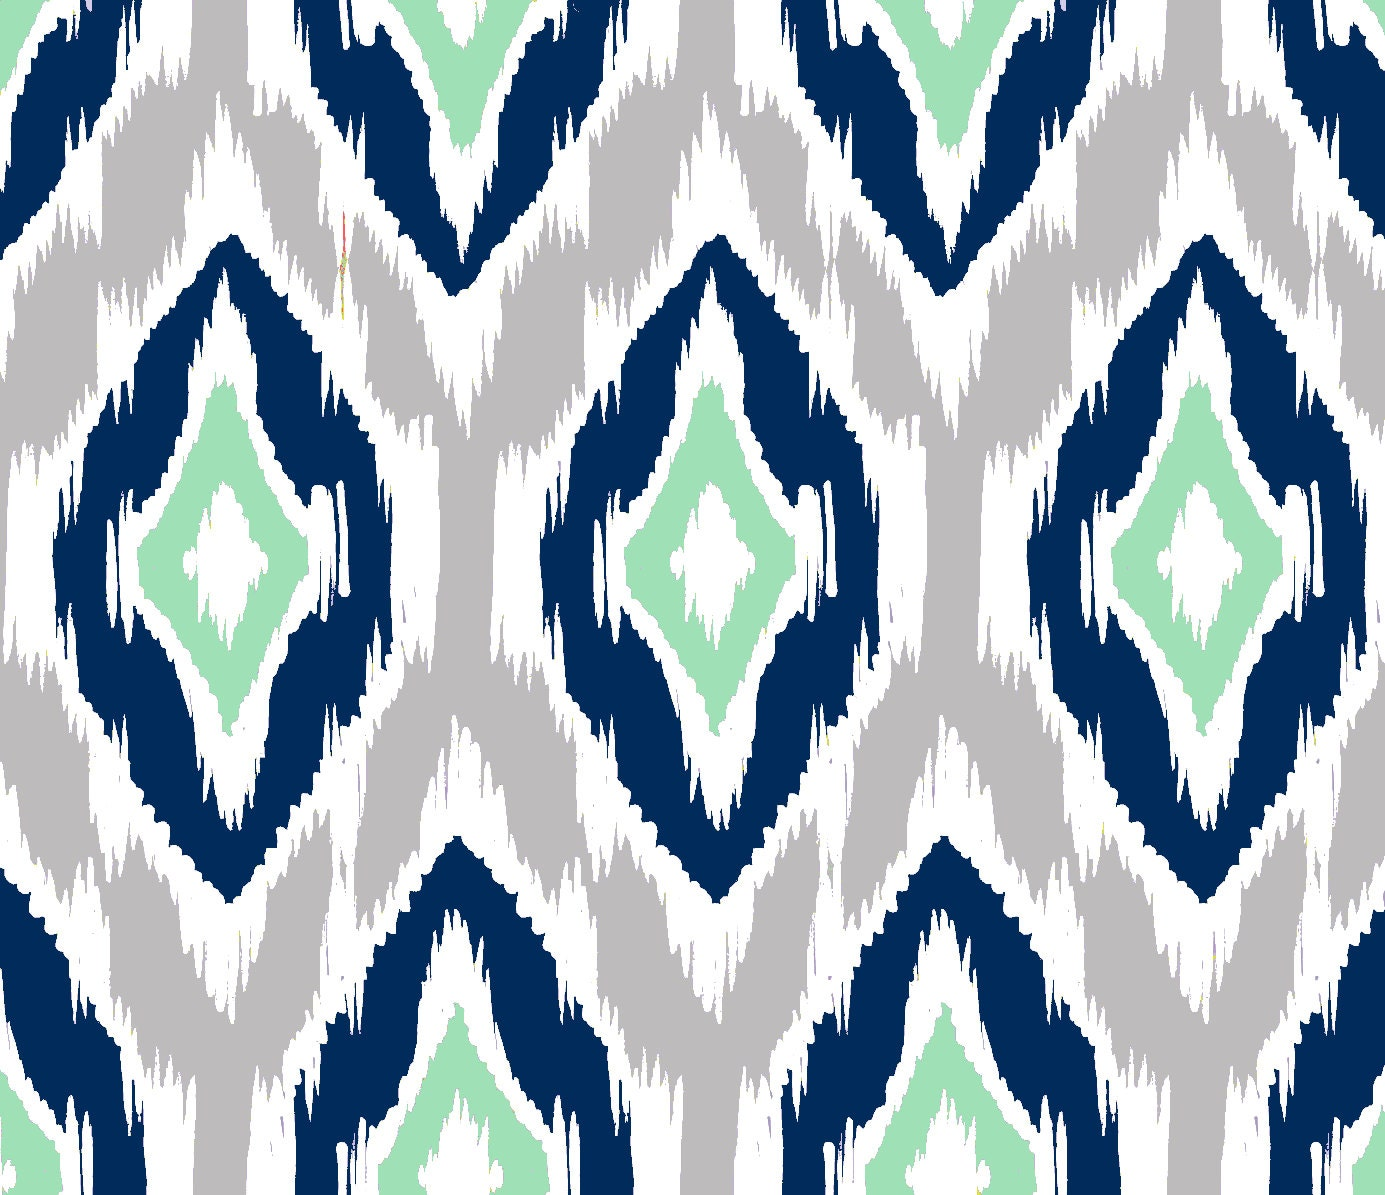 Amazoncom navy blue rugs Home amp Kitchen